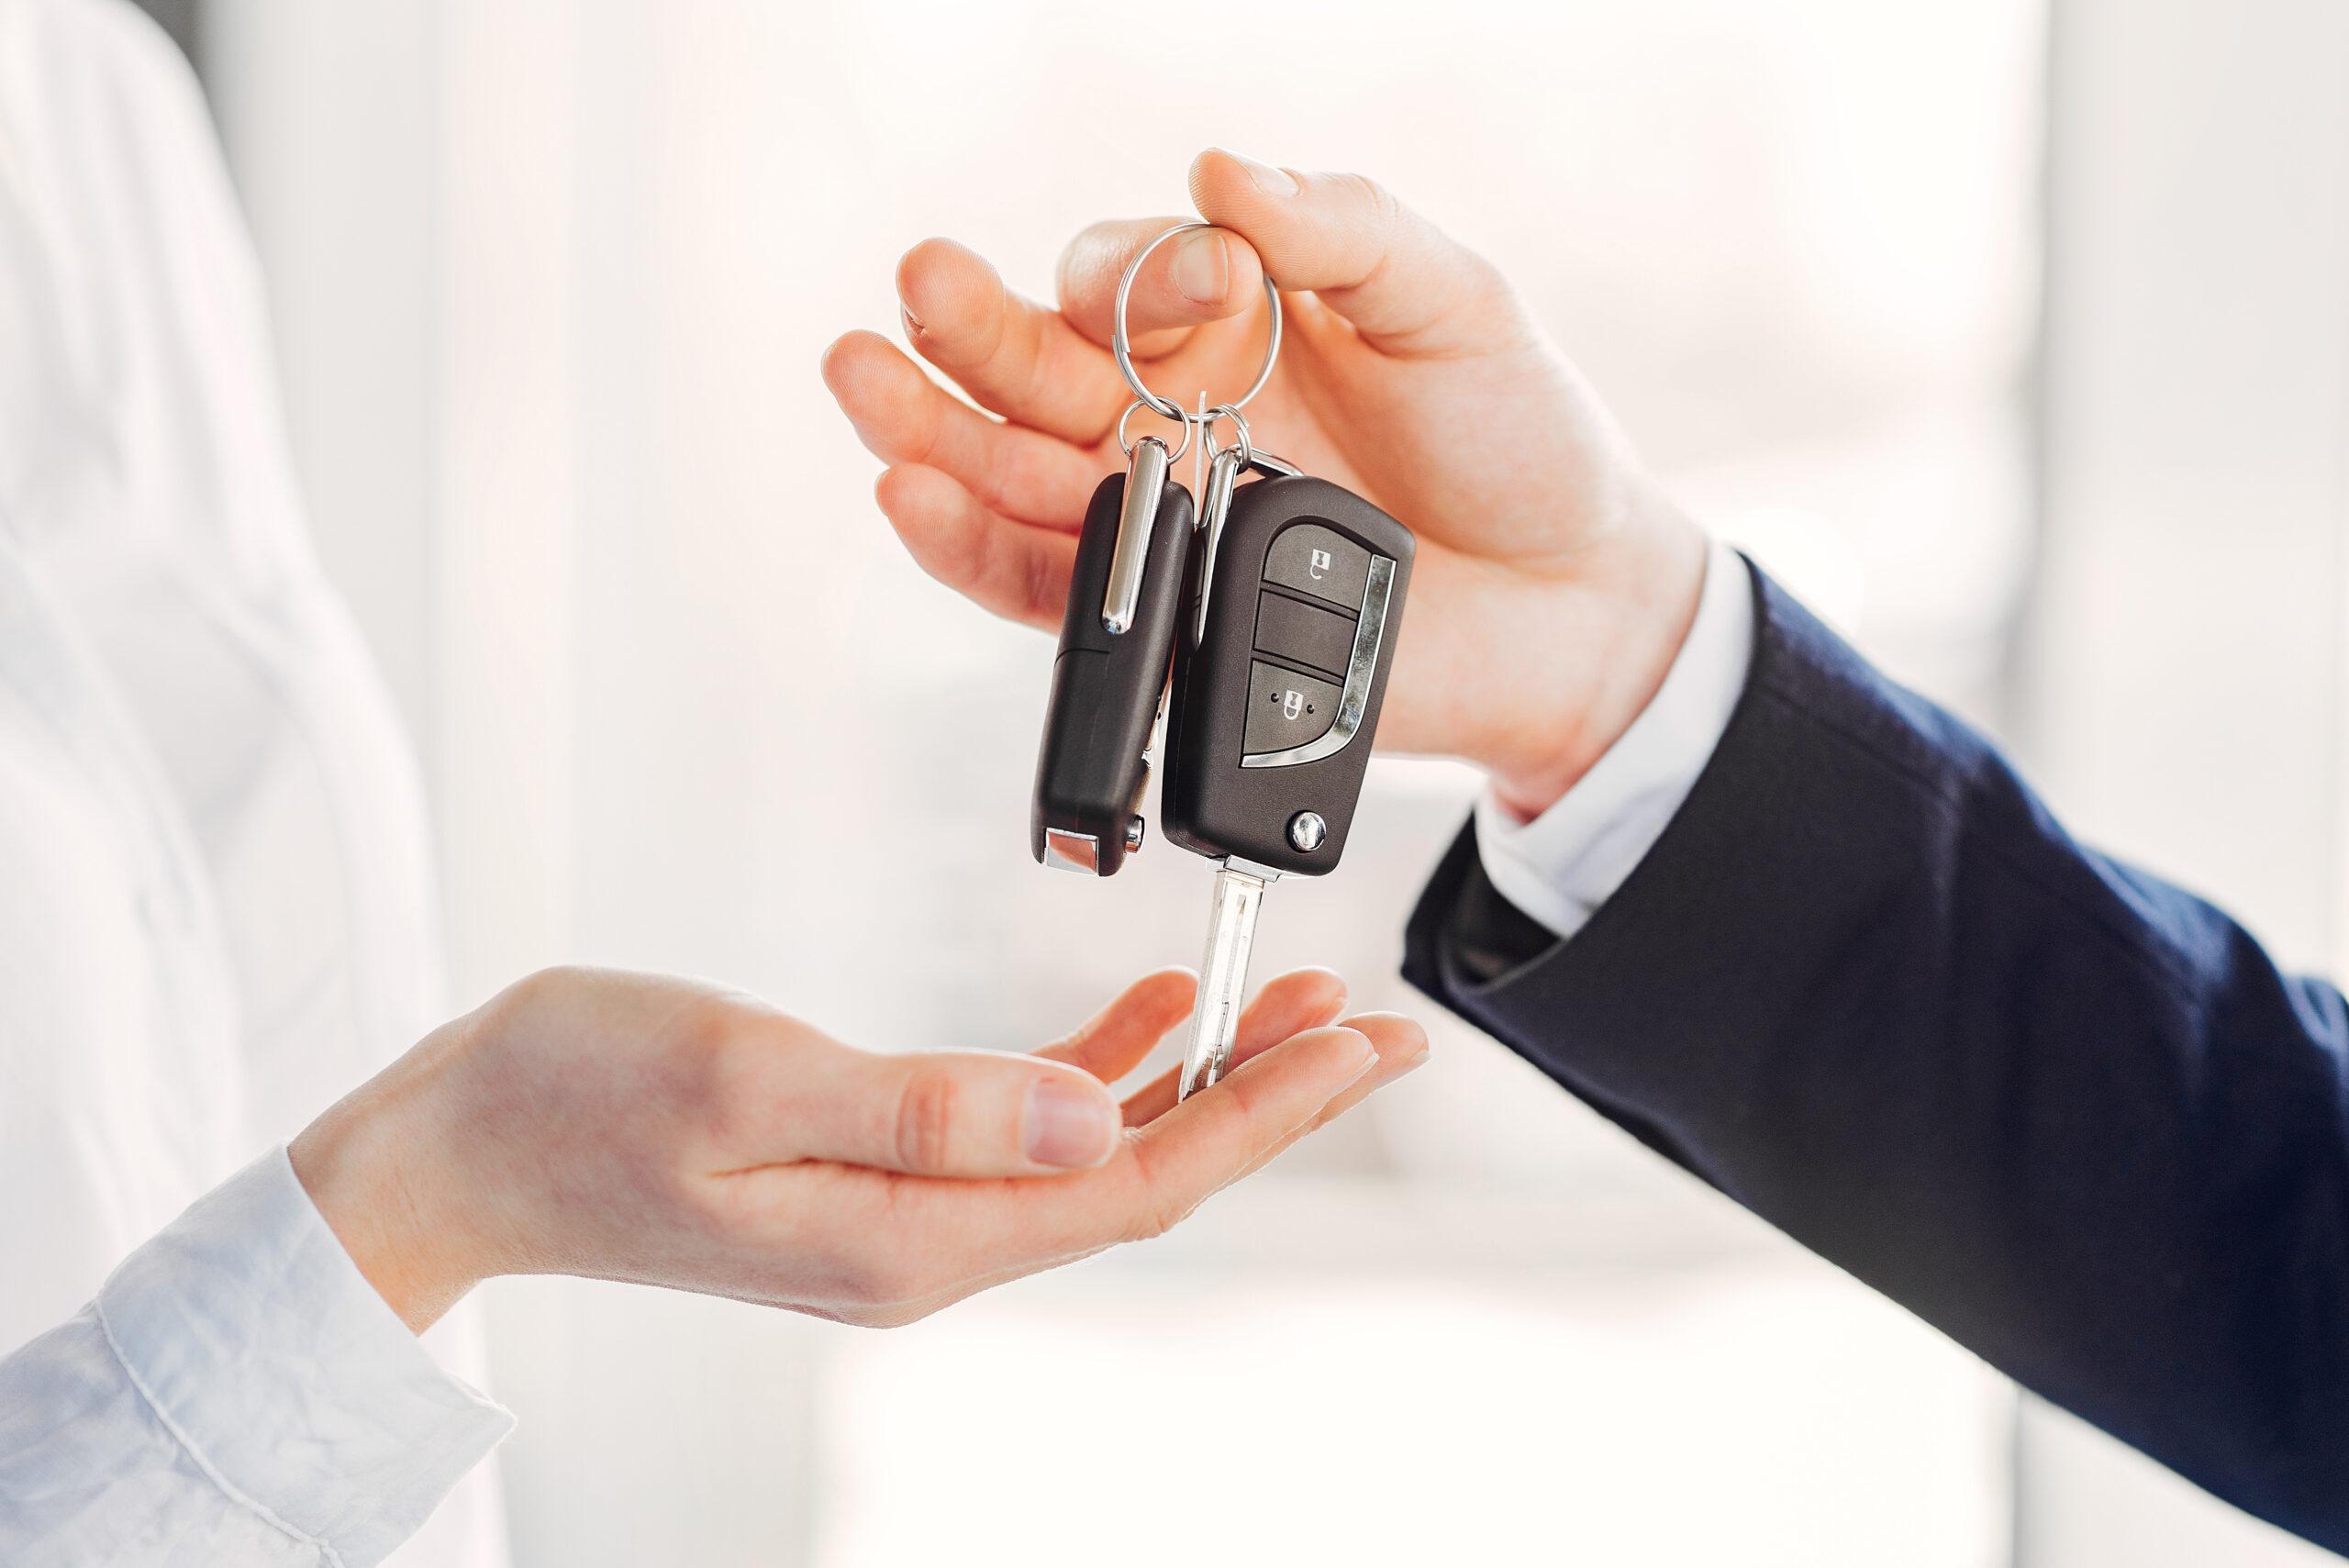 Pessoa entregando chave de carro barato para outra